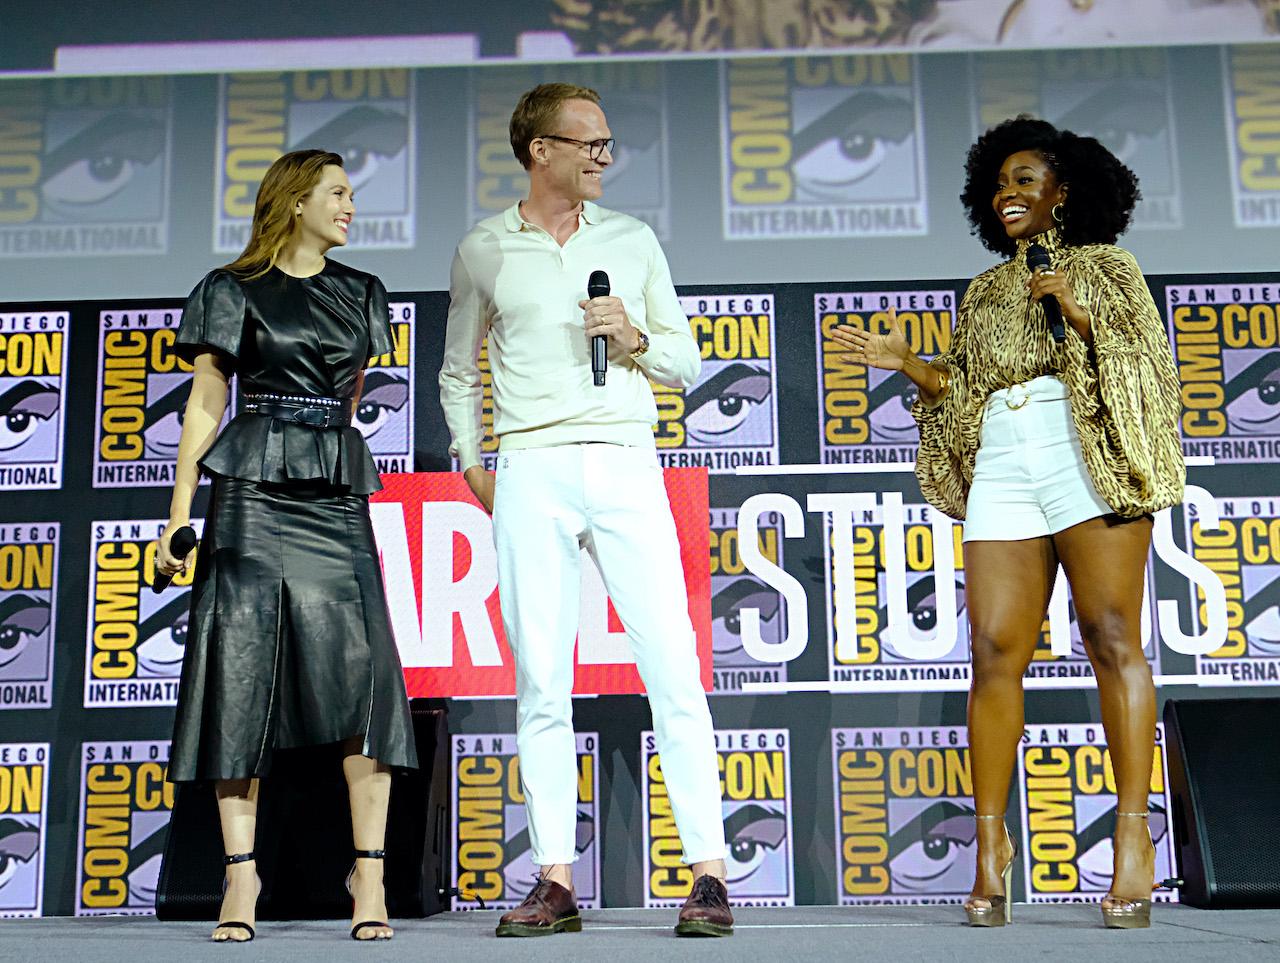 Elizabeth Olsen, Paul Bettany and Teyonah Parris of Marvel Studios' 'WandaVision' at the San Diego Comic-Con International 2019